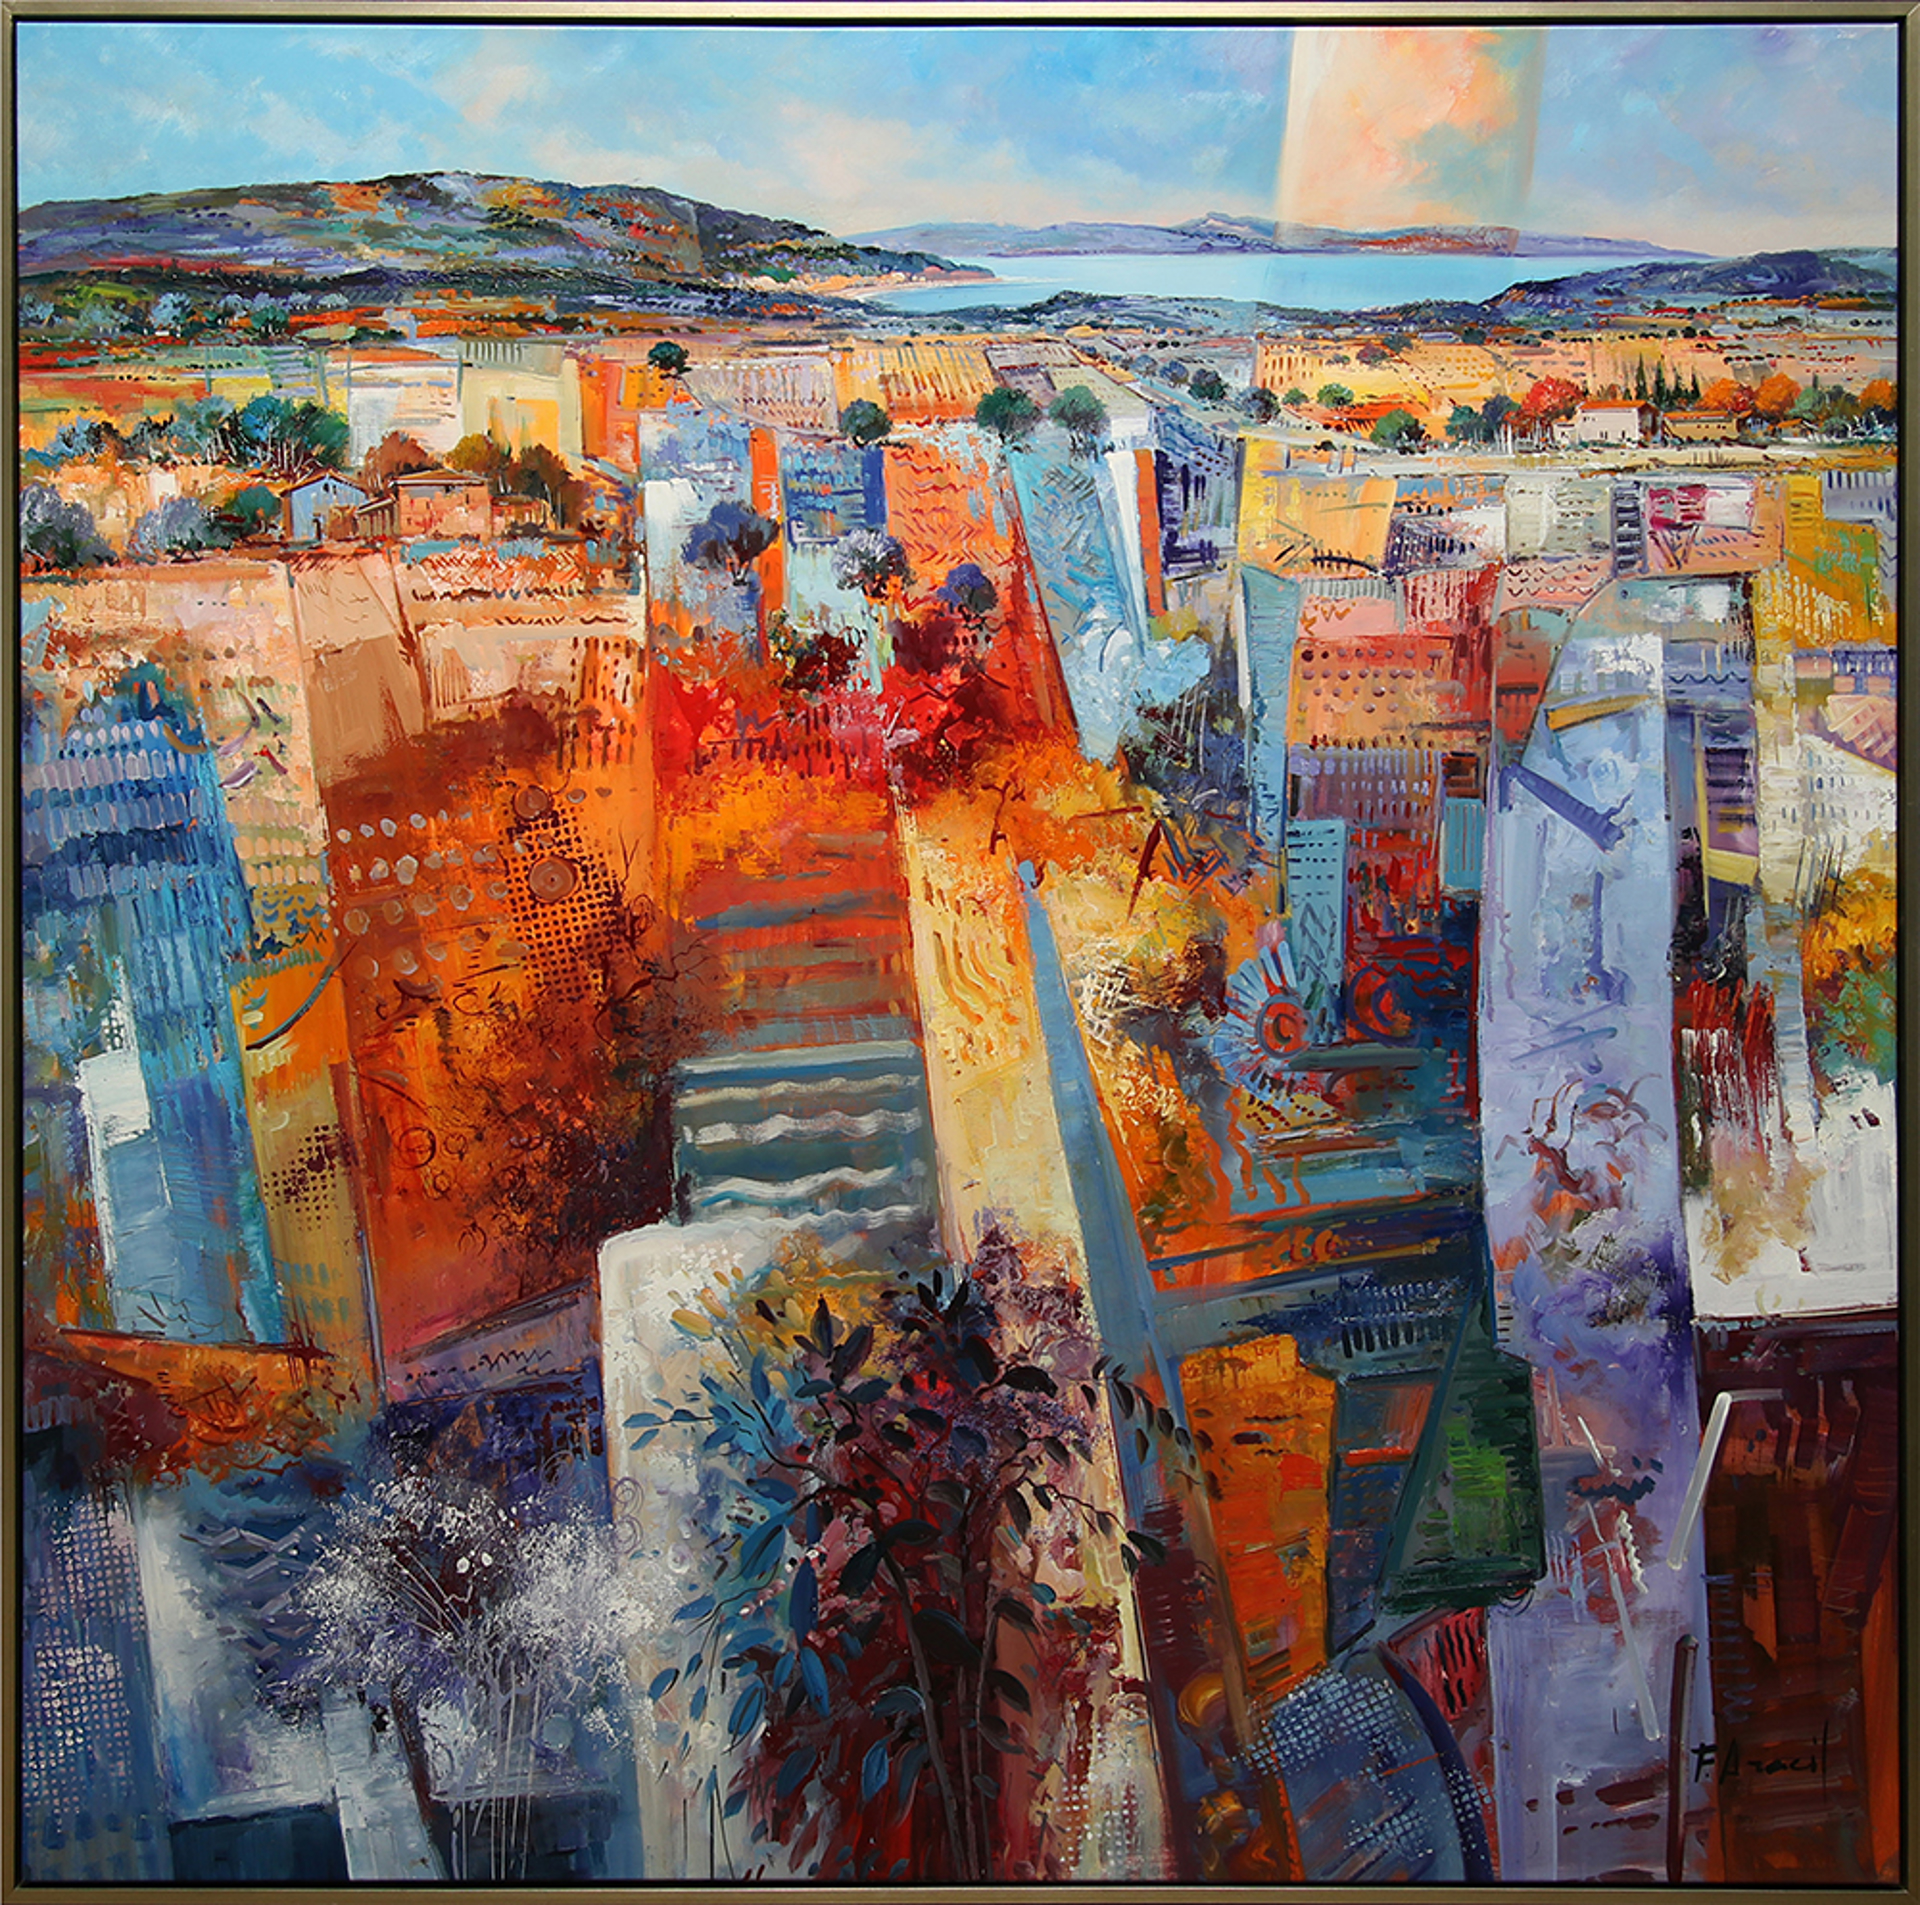 Of Land and Sea by Fernando Aracil